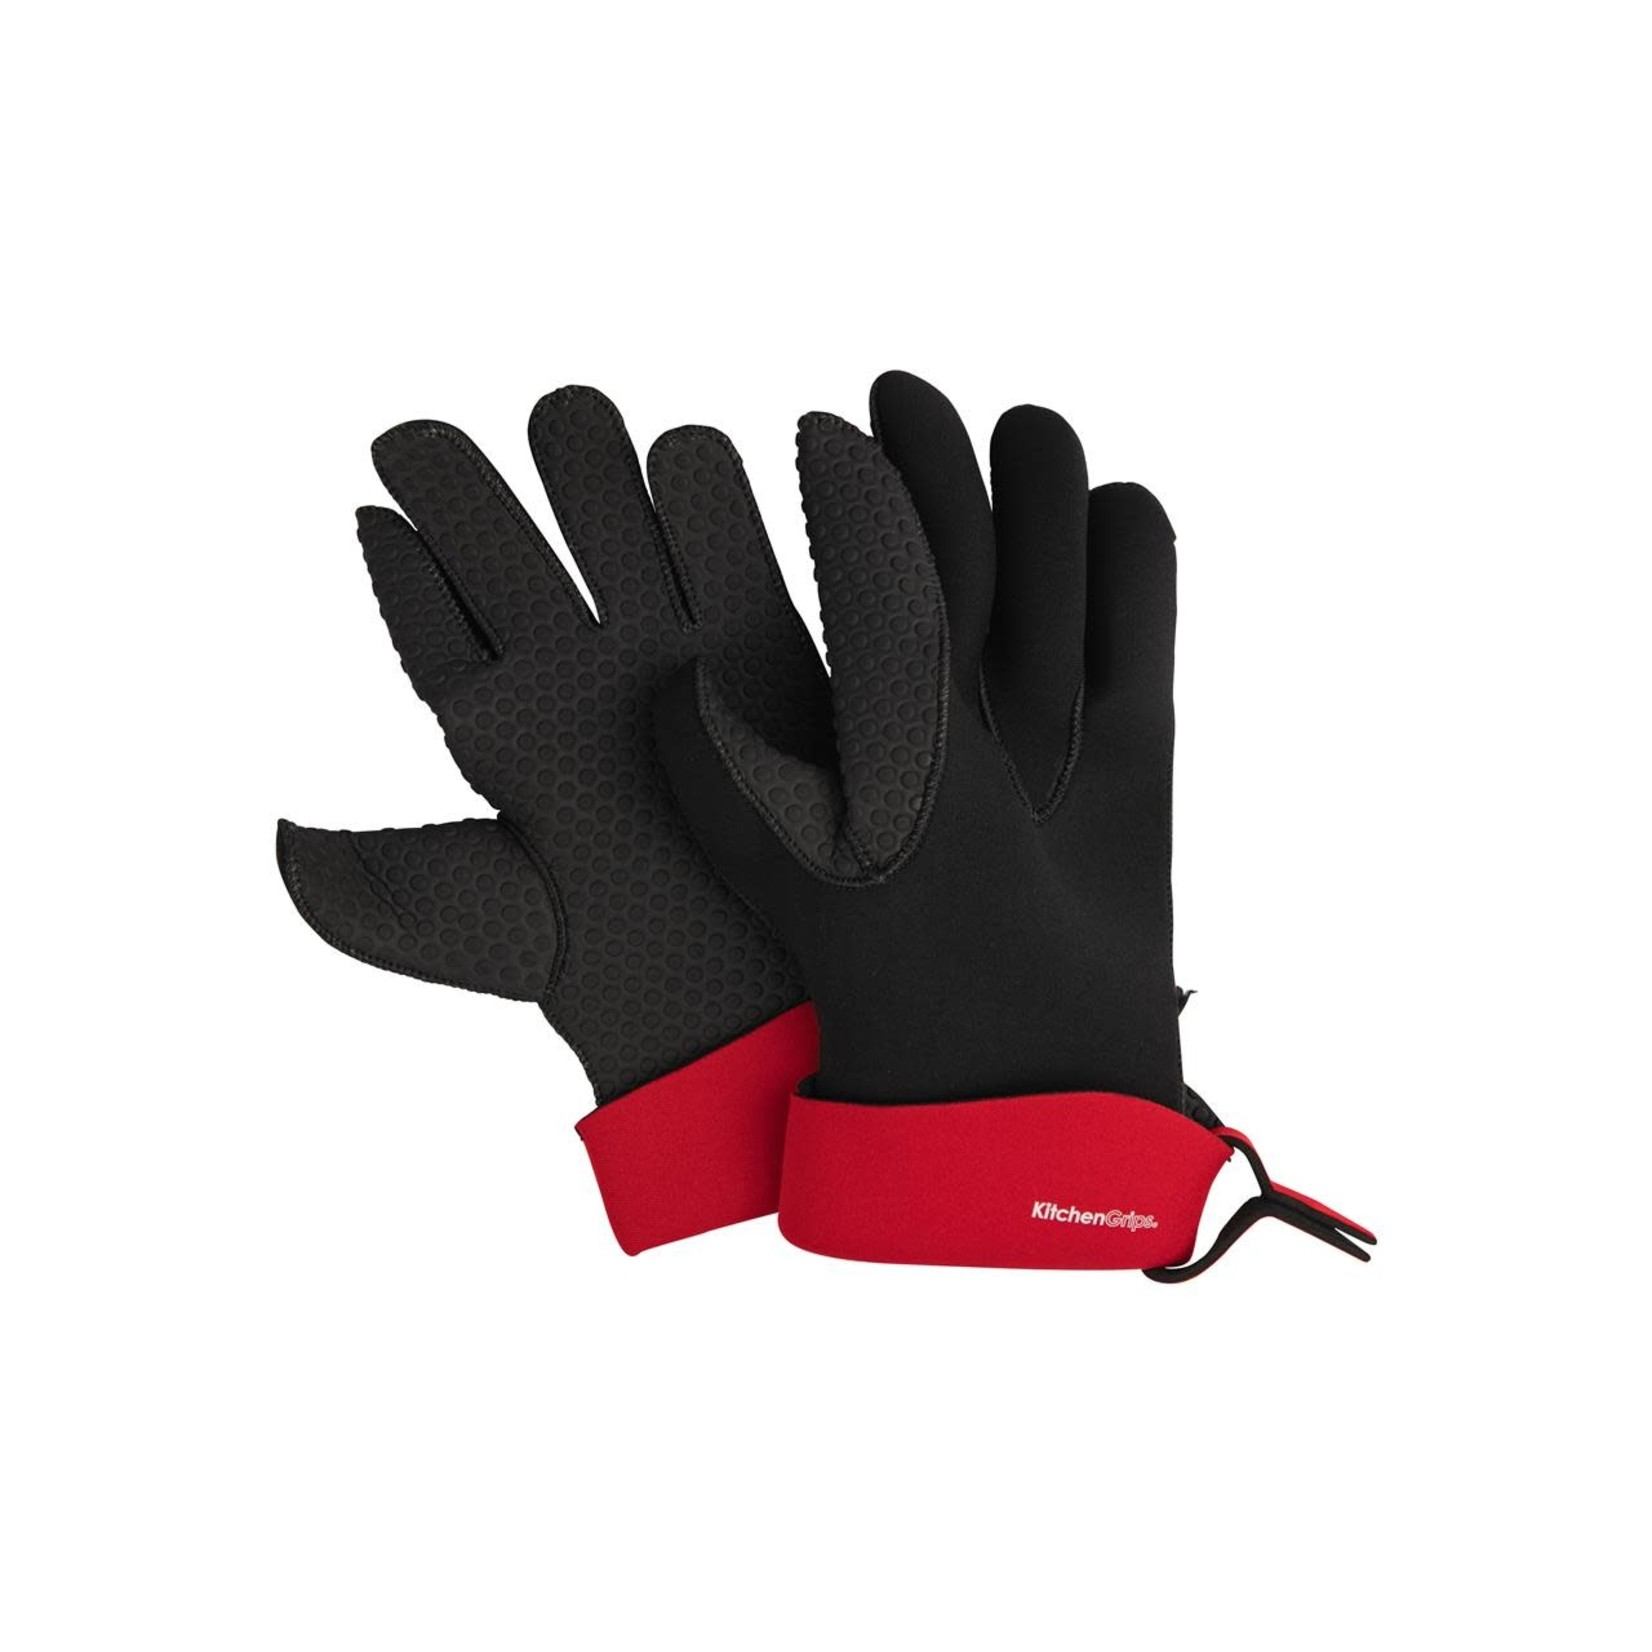 Cherry Kitchen Grips 5-Finger Glove, Large